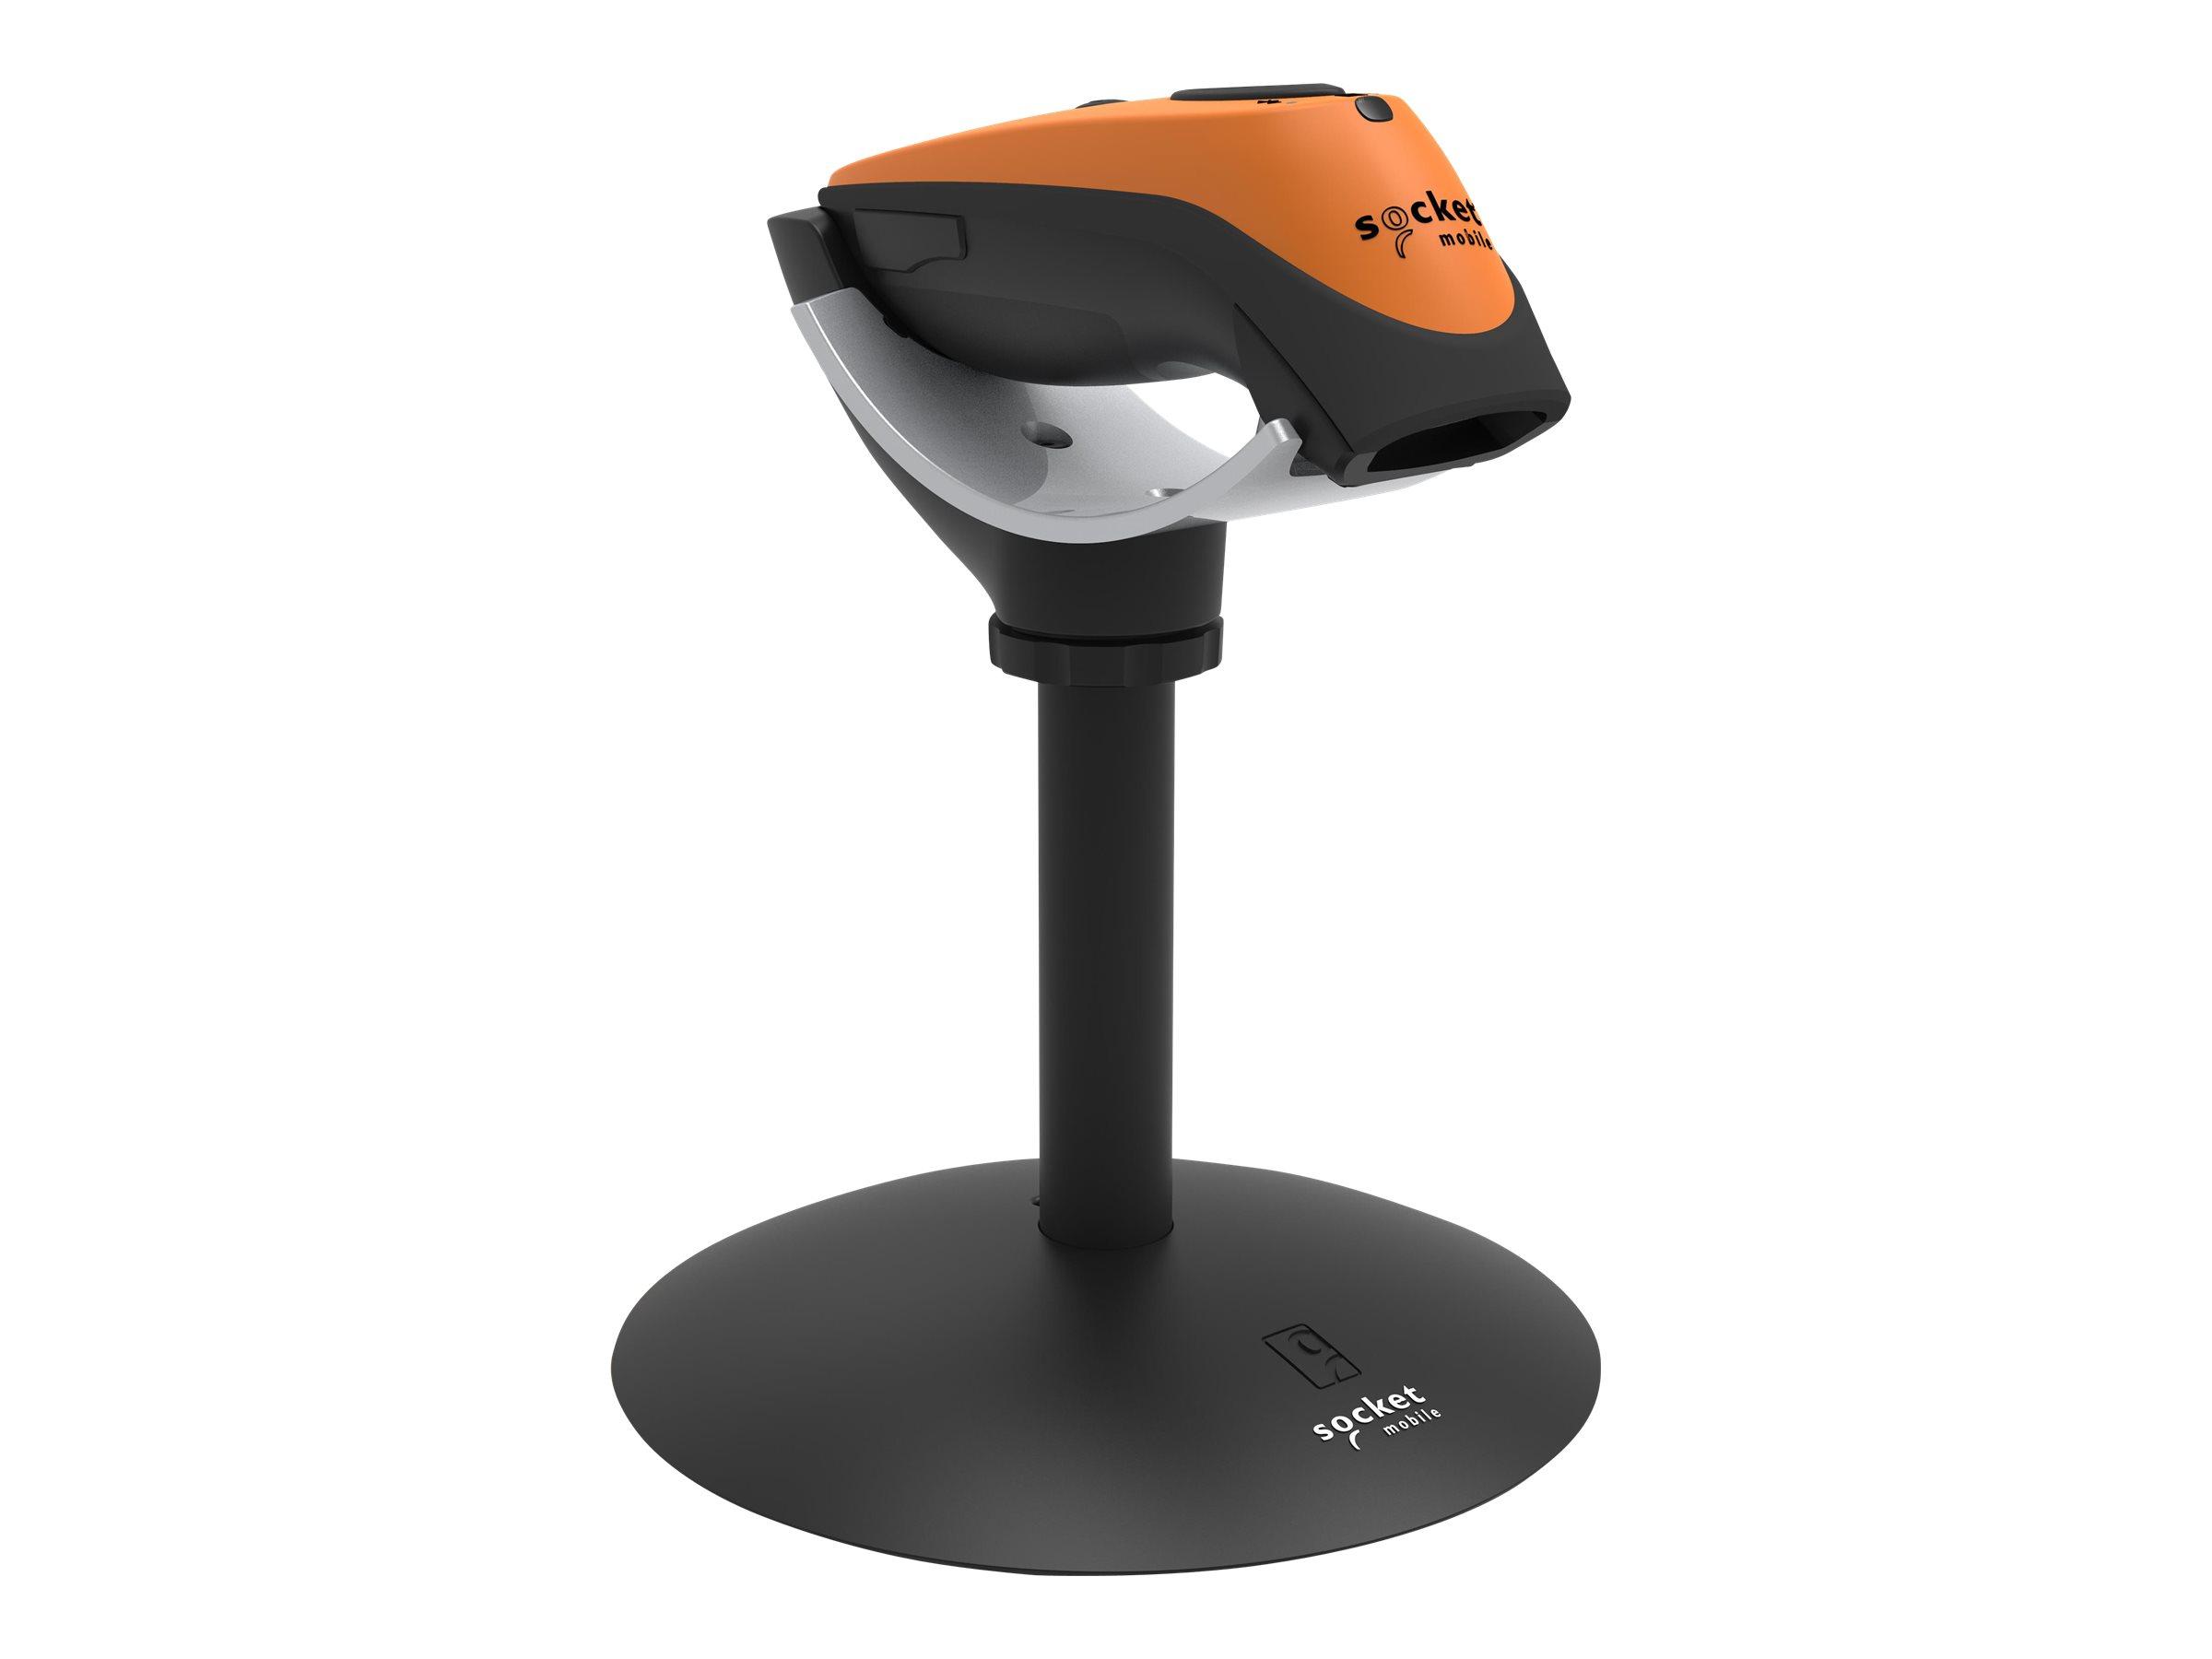 DuraScan D750 - Mit Ladestation - Barcode-Scanner - tragbar - 2D-Imager - decodiert